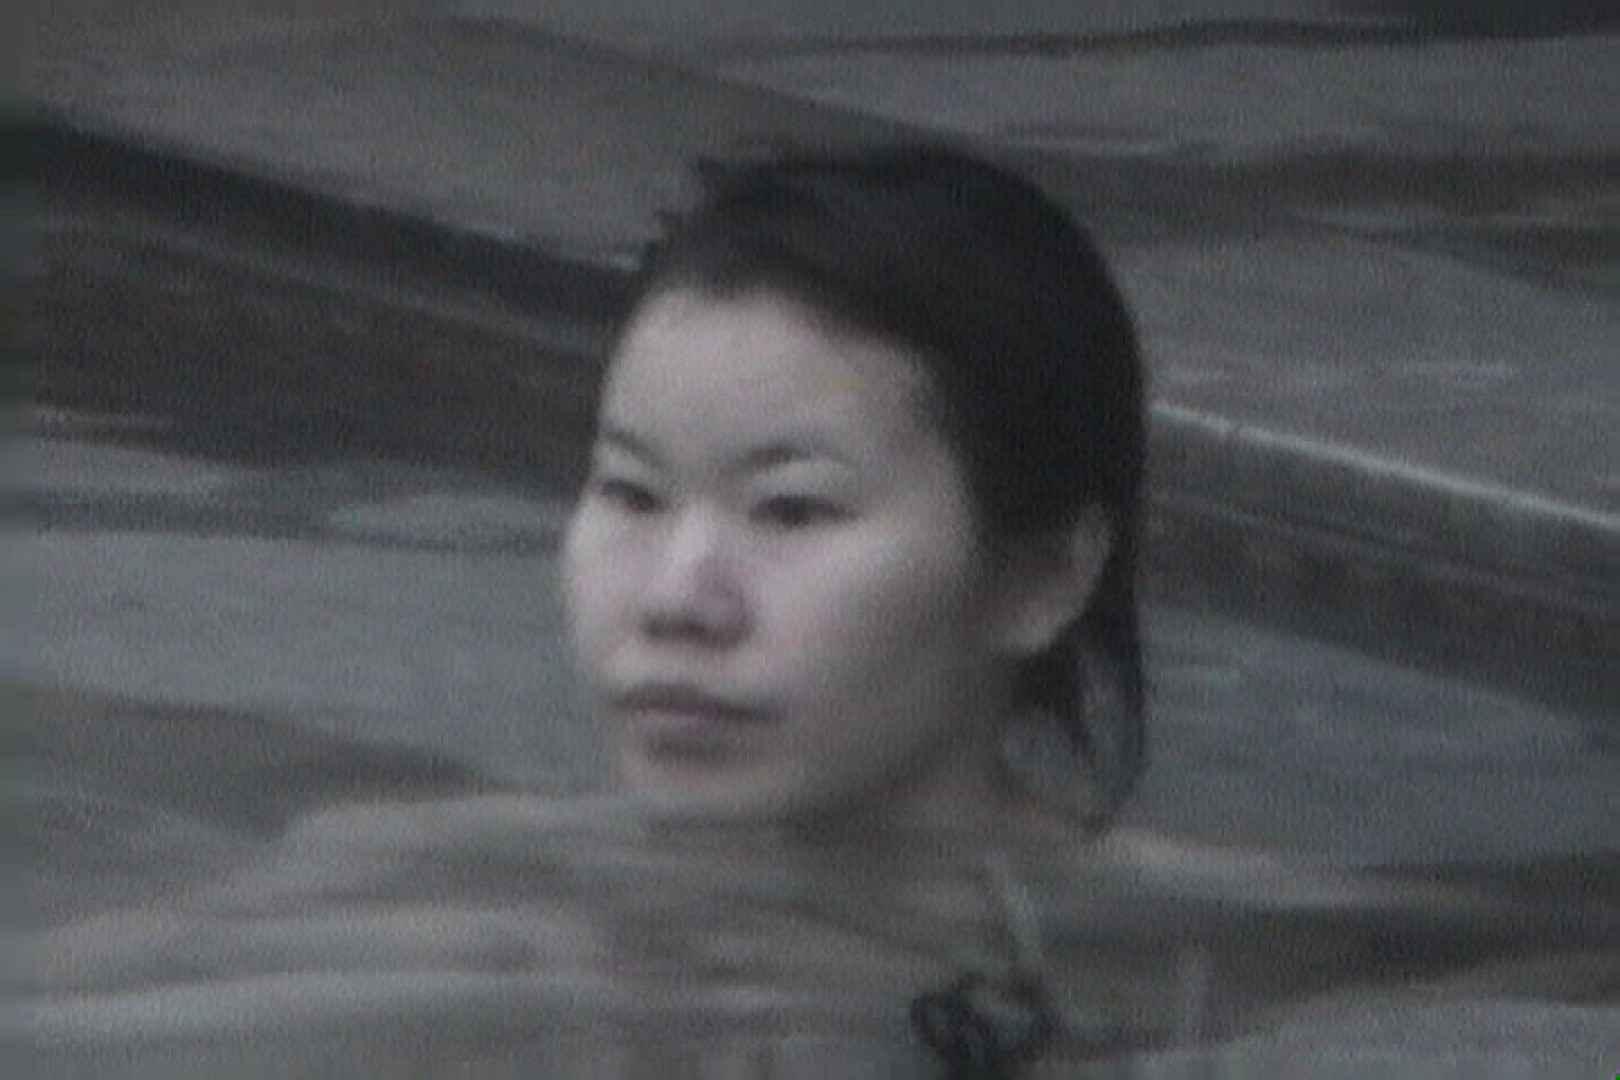 Aquaな露天風呂Vol.556 美しいOLの裸体 すけべAV動画紹介 69pic 65